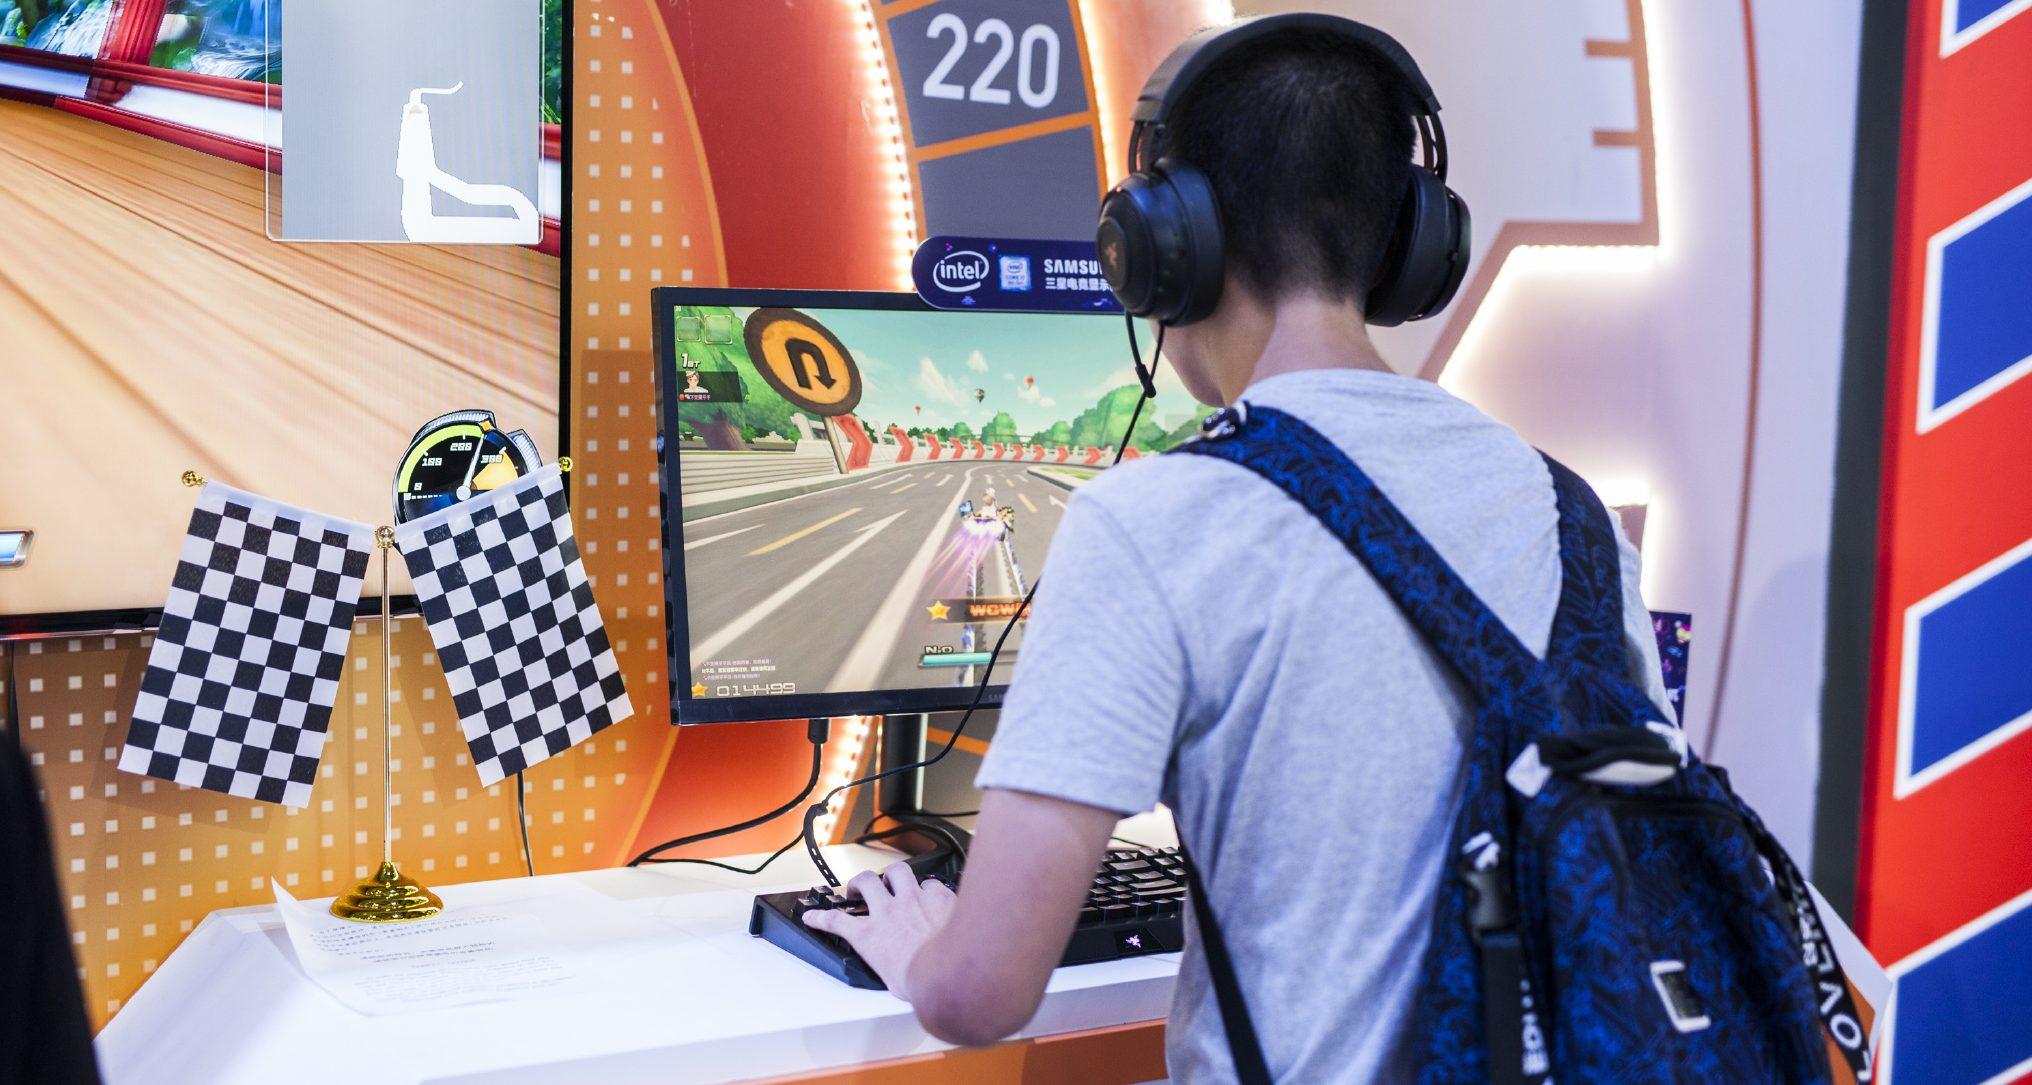 China roundup: Games are opium, algorithms need scrutiny   TechCrunch